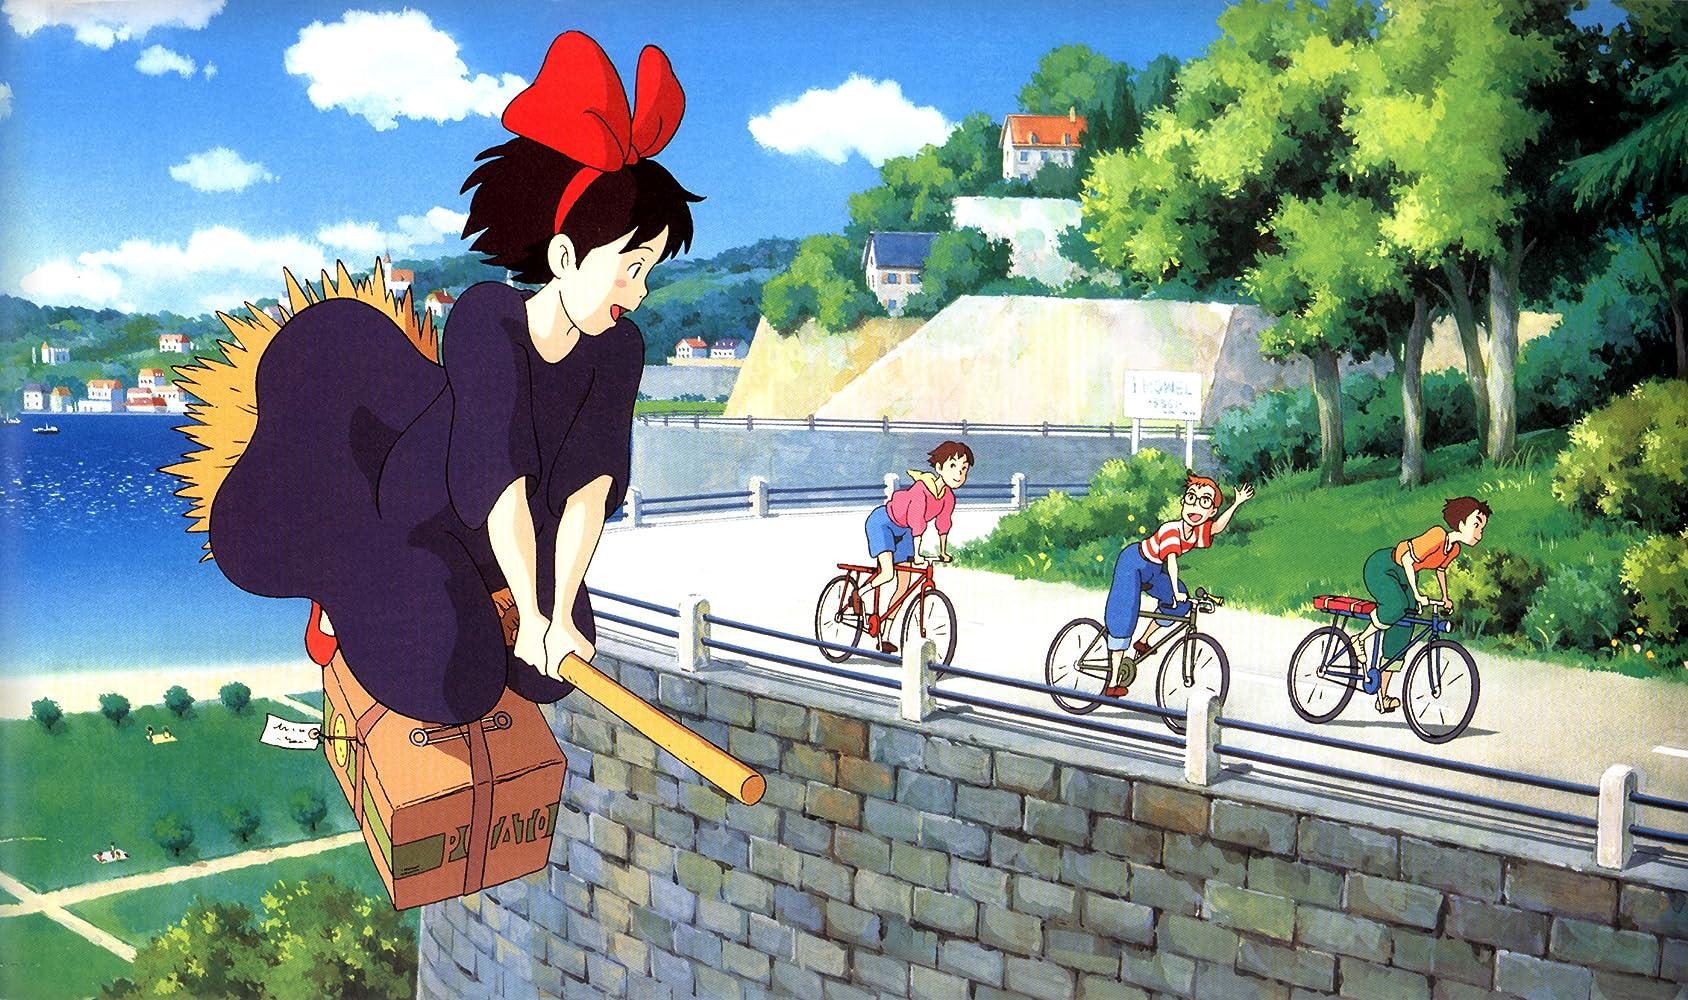 Kết quả hình ảnh cho Majo no Takkyuubin (Kiki's Delivery Service)